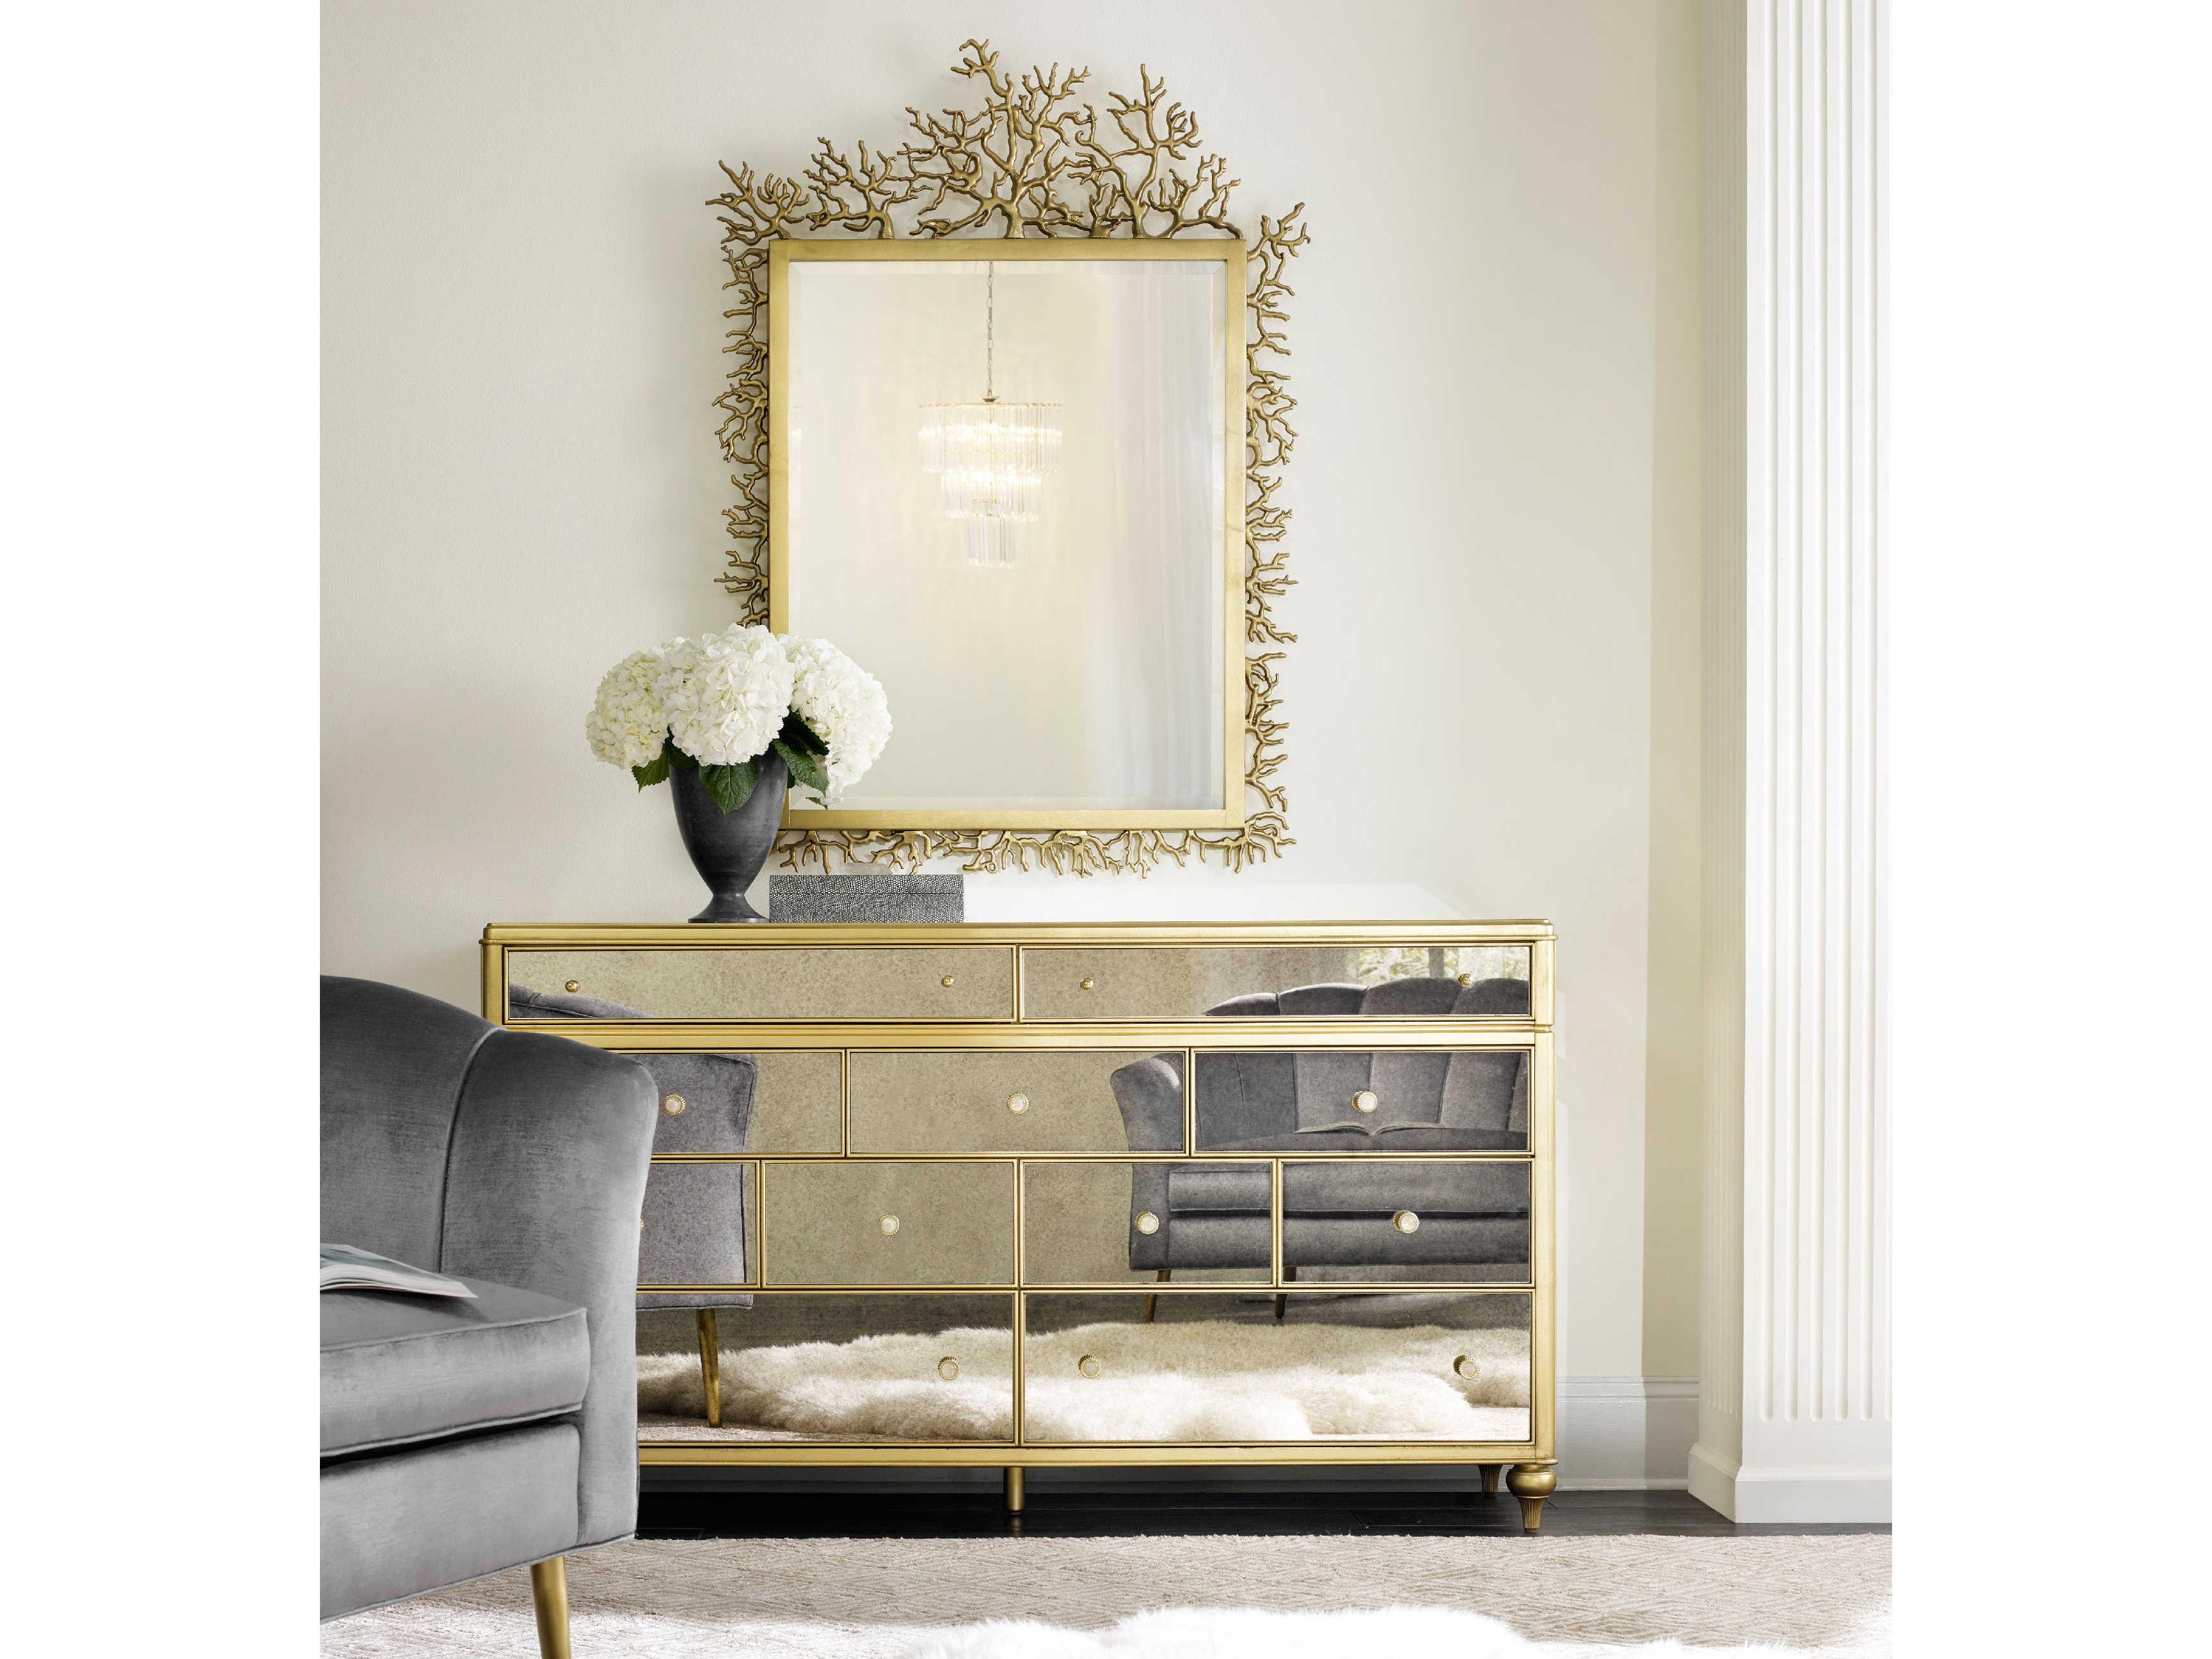 Hooker Furniture Cynthia Rowley Gold 39 W X 53 H